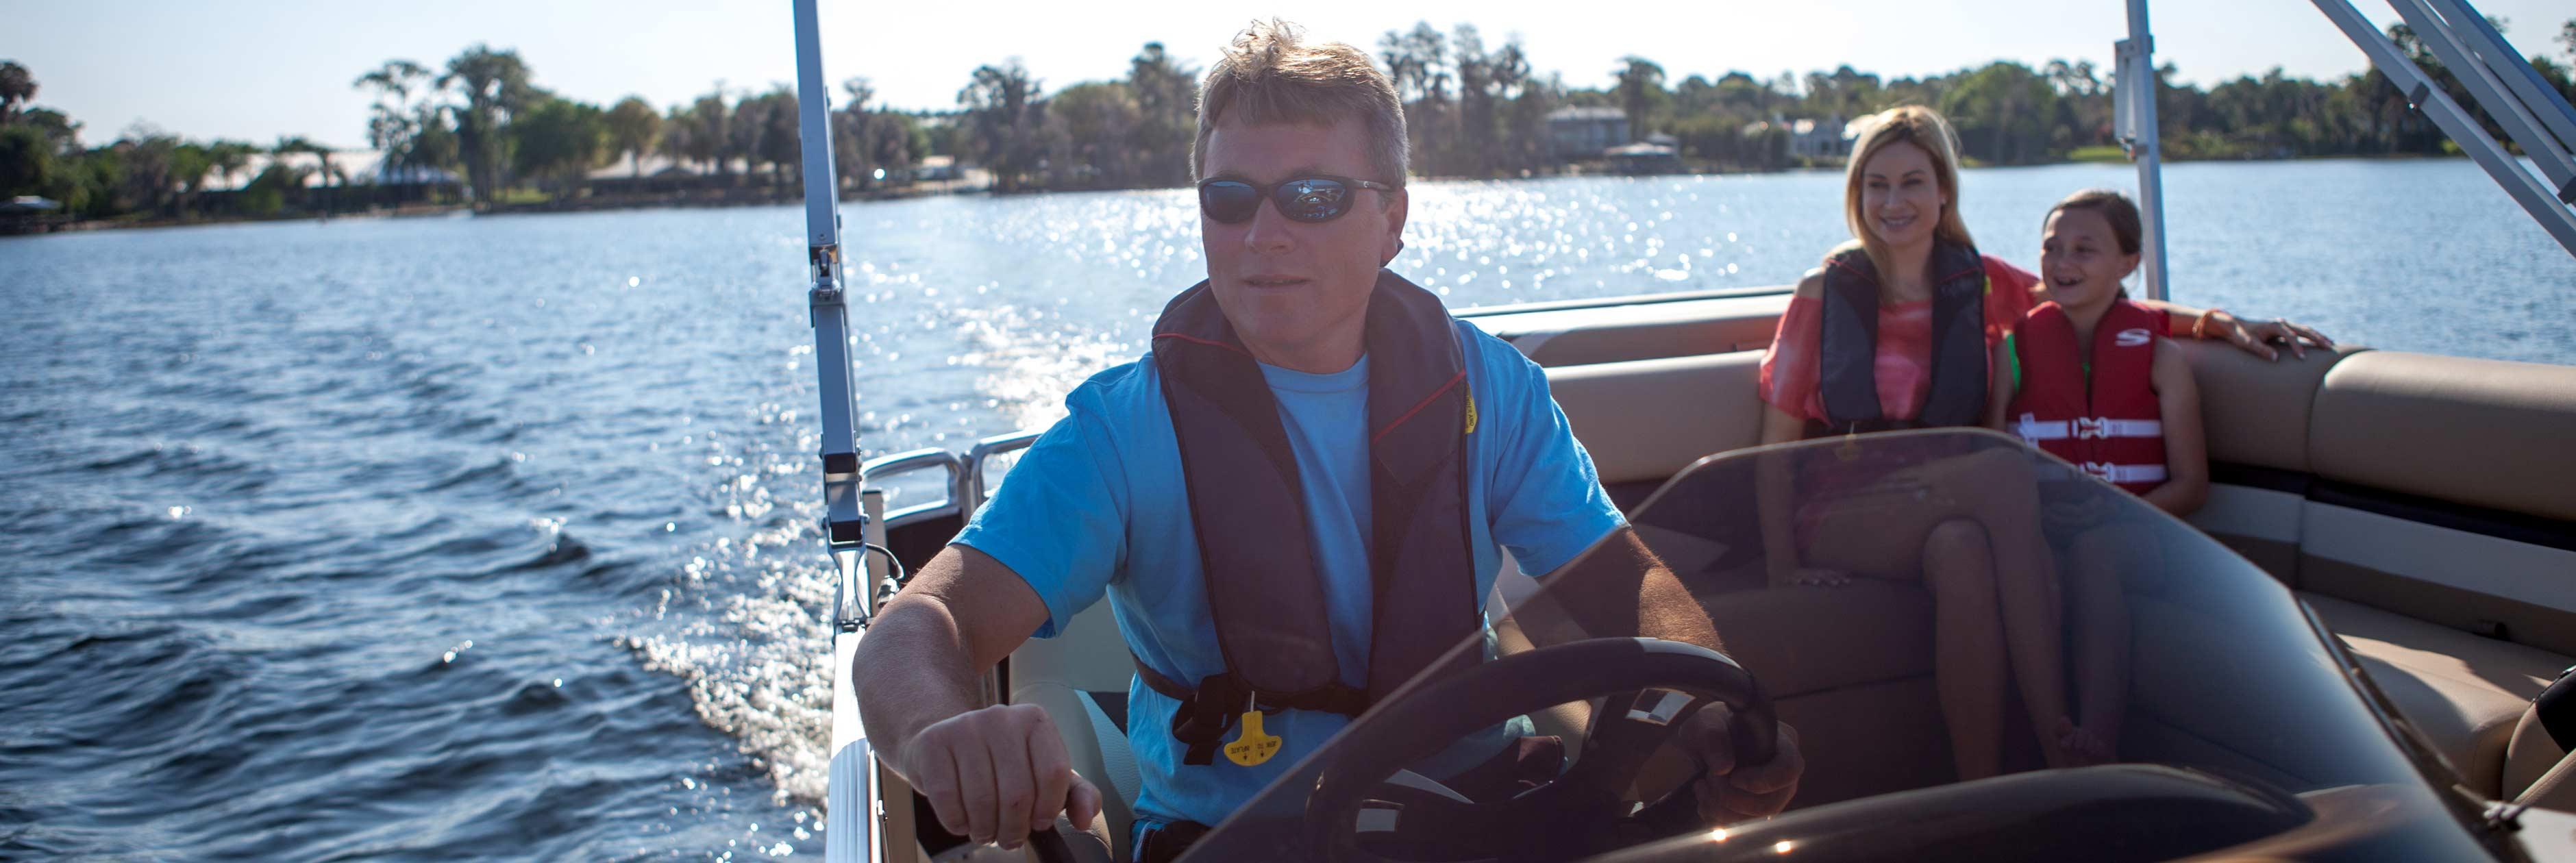 Why Buy a Pontoon Boat